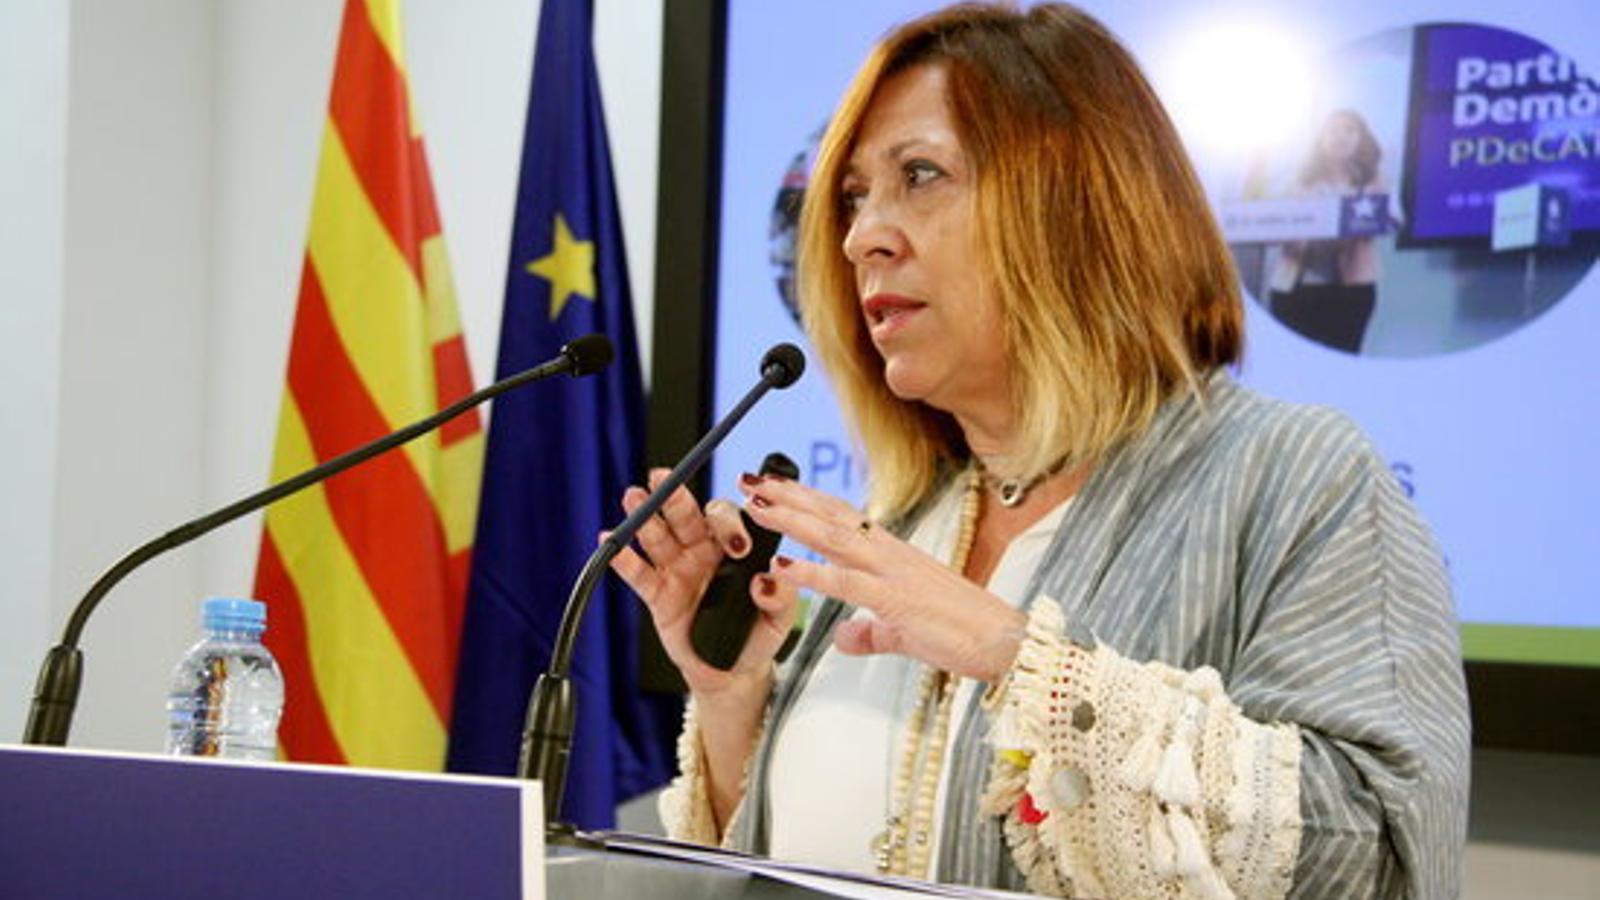 [LR] Artur Mas: Madrid está a 600 km y Barcelona está a 50km Directora-referendum-PDECat-Montserrat-Candini_1801629972_41054782_651x366